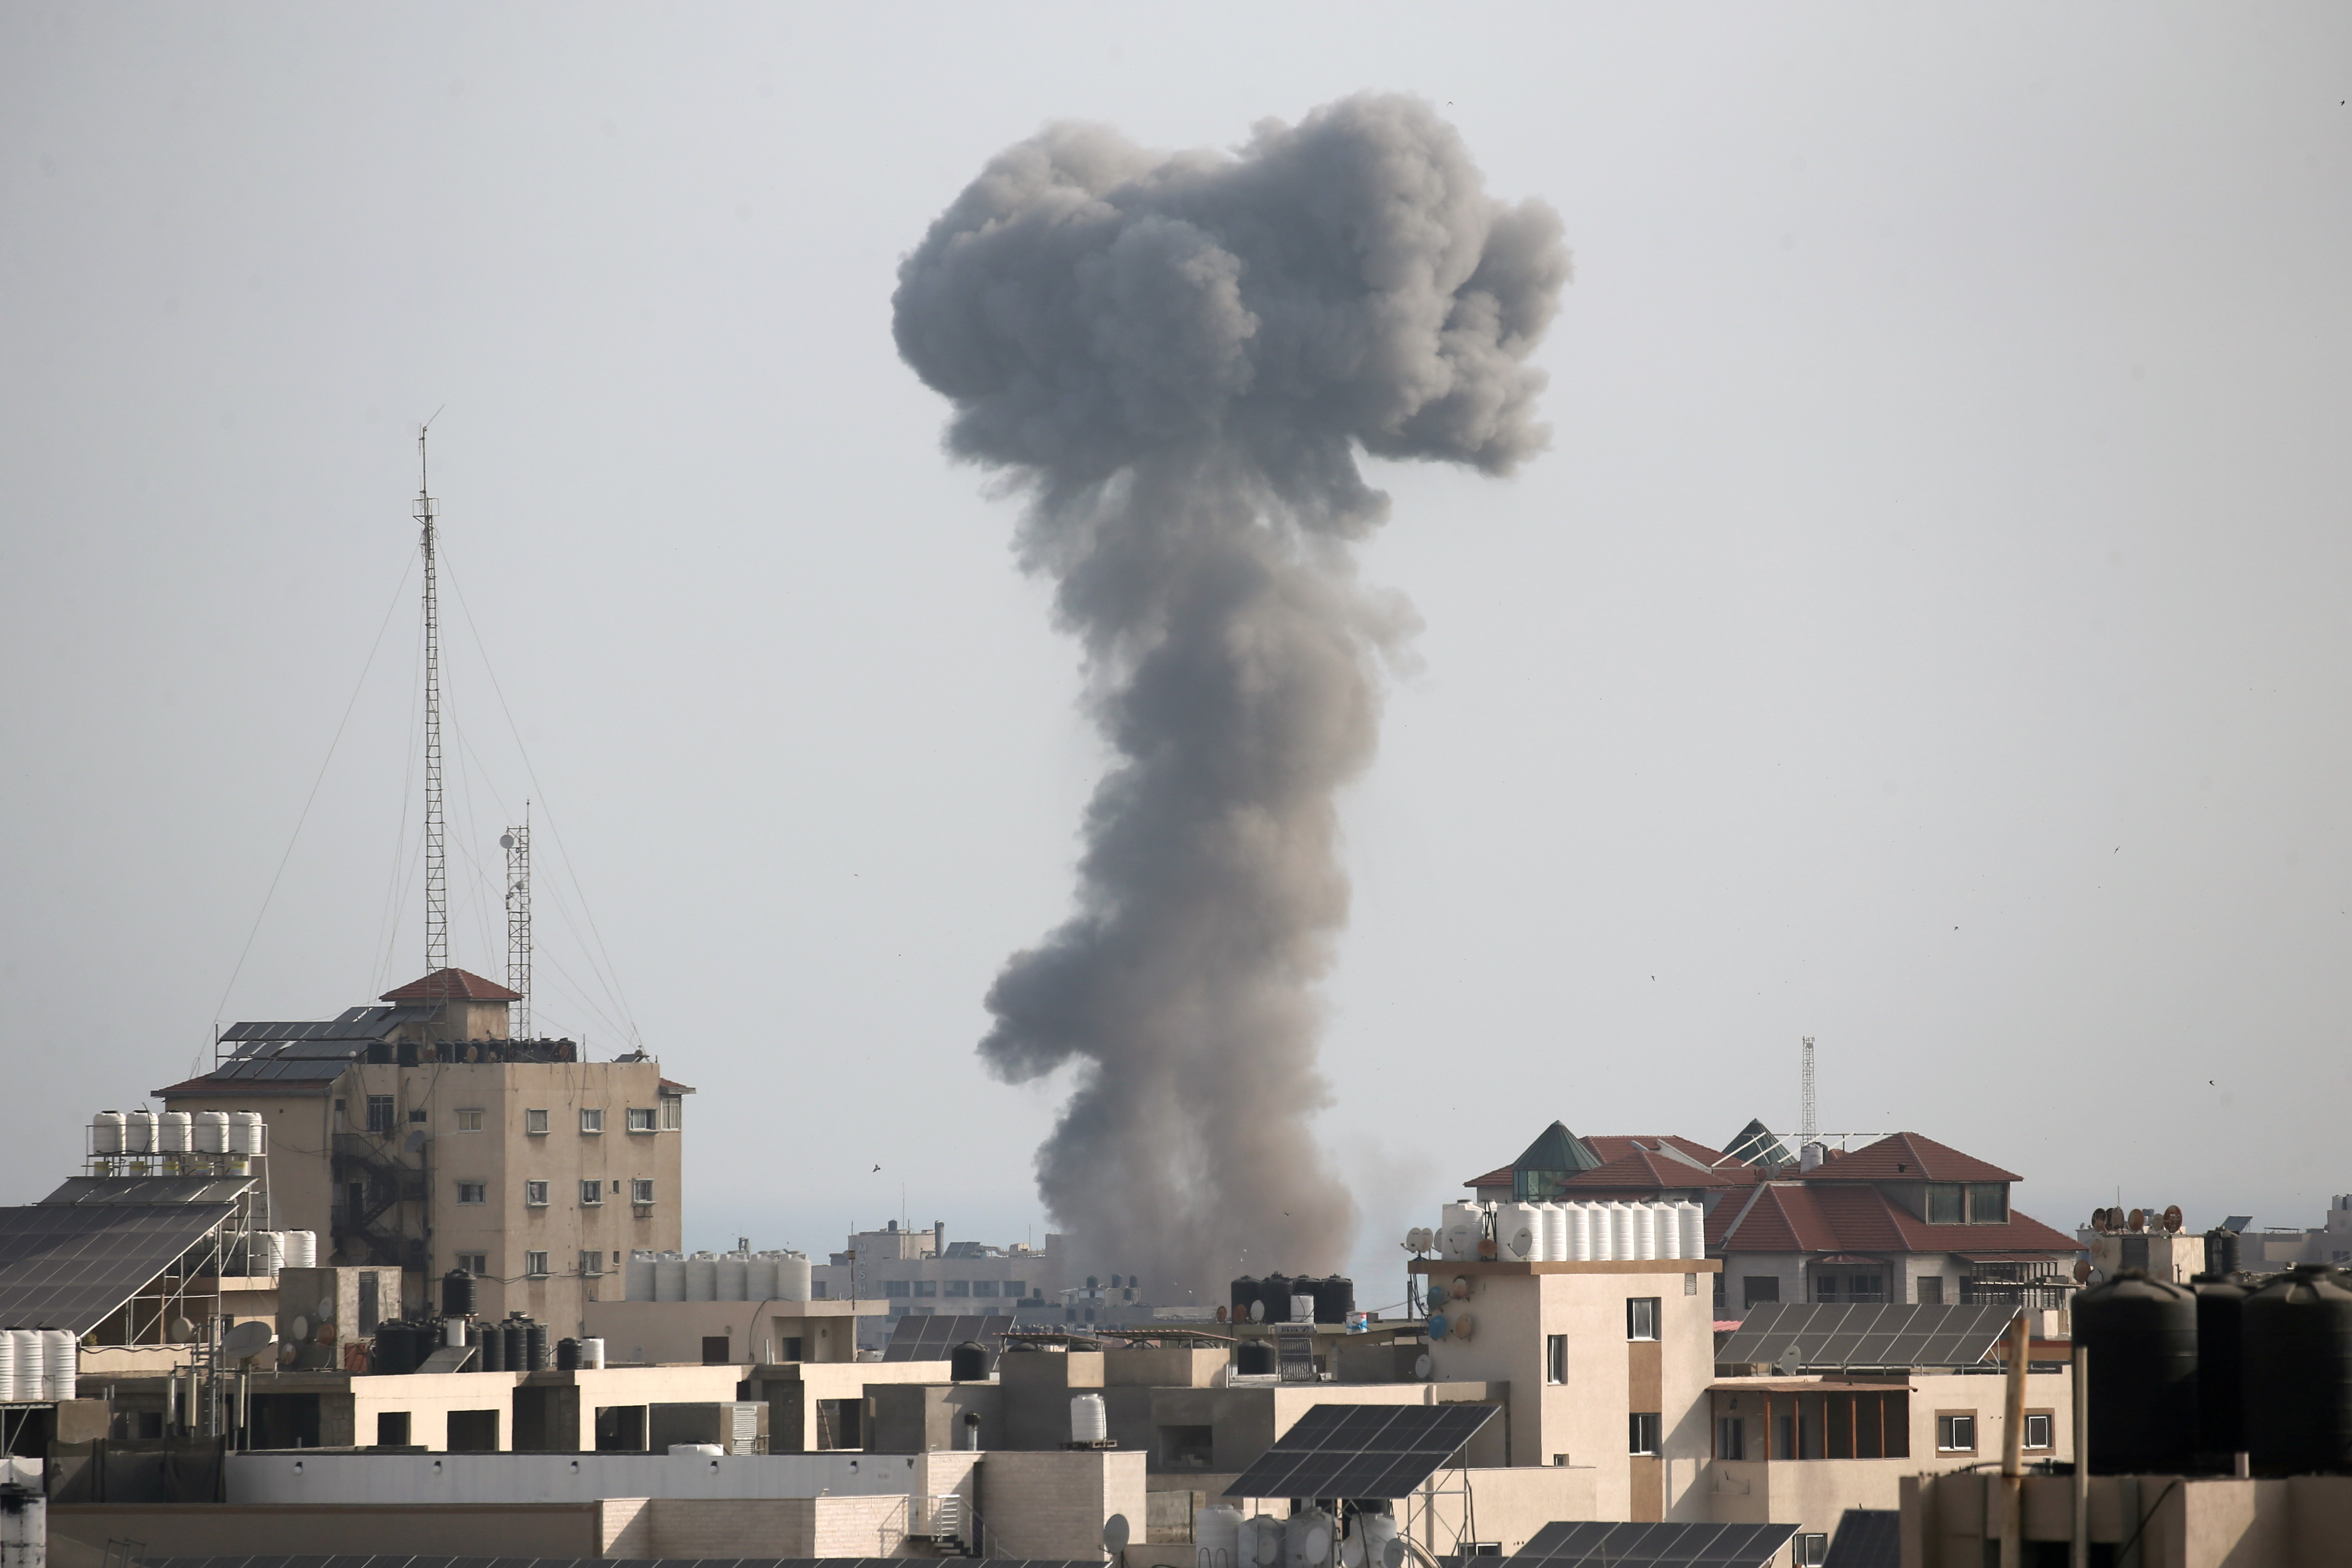 Smoke rises following an Israeli air strike, amid Israeli-Palestinian fighting, in Gaza, May 20, 2021. REUTERS/Ibraheem Abu Mustafa